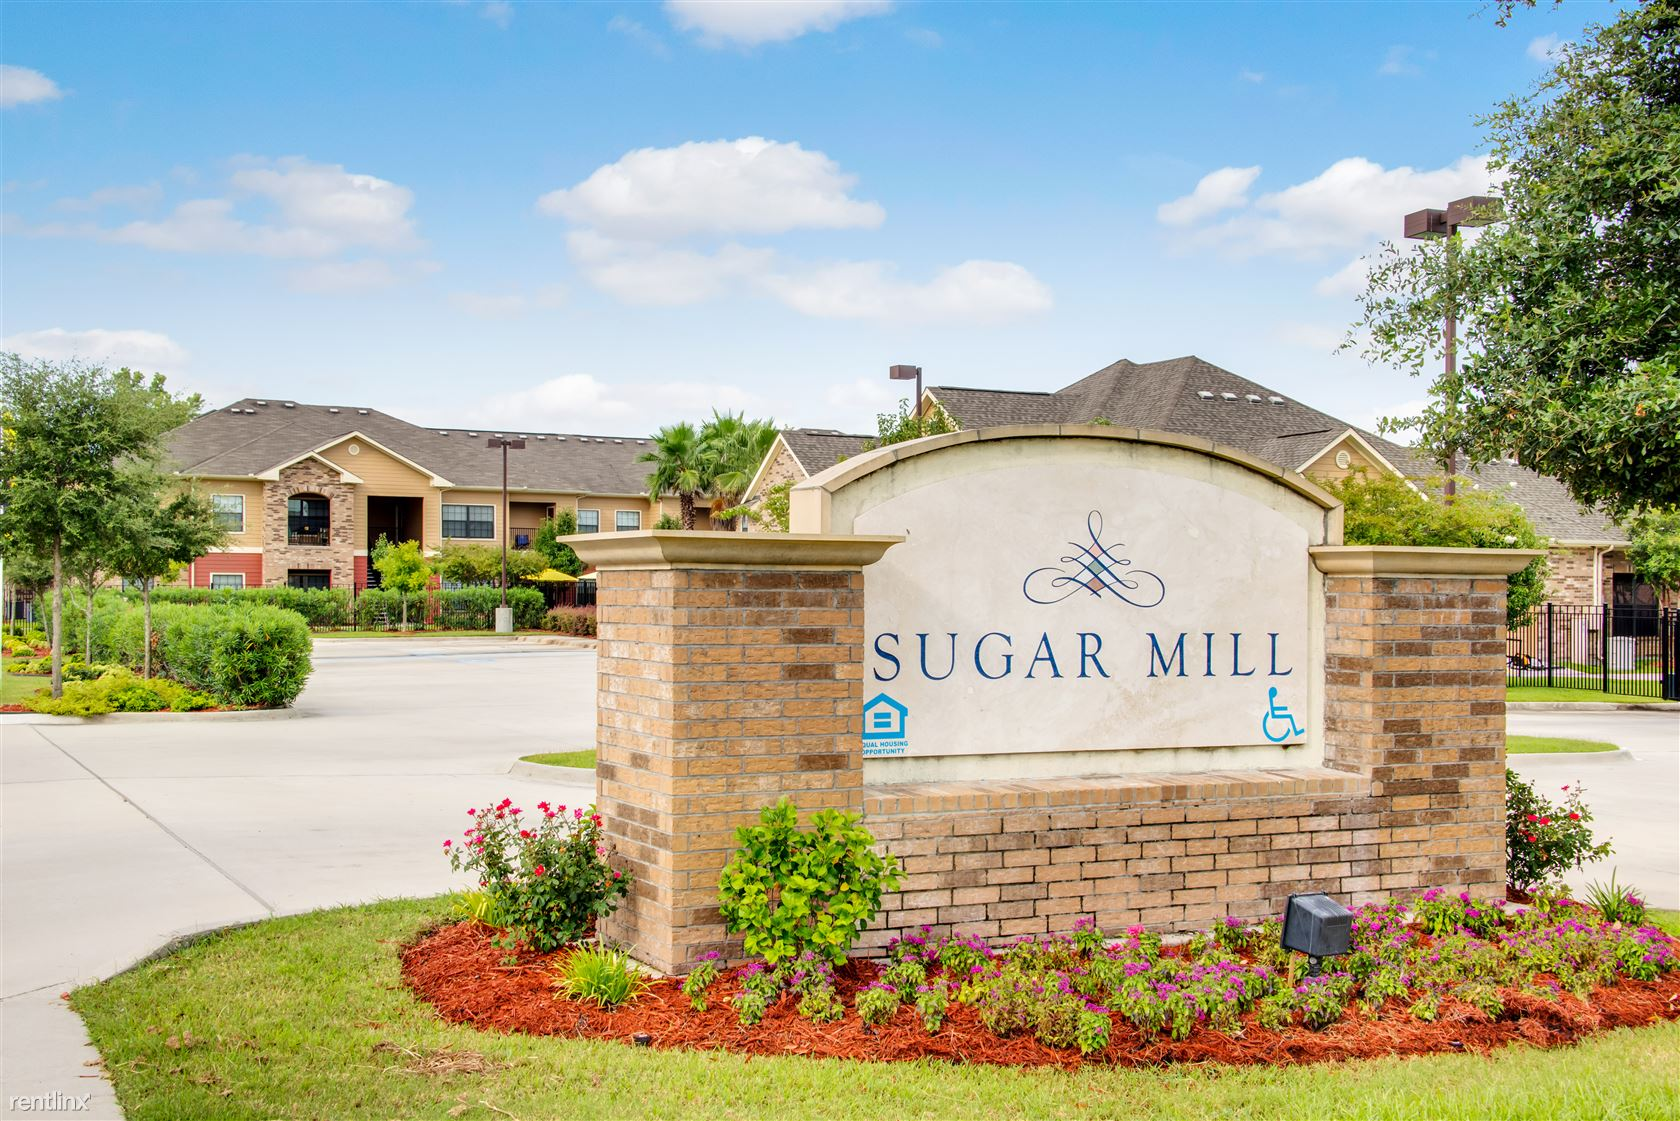 $1000 - $1220 per month , 6795 Belle Vale Dr, Sugar Mill